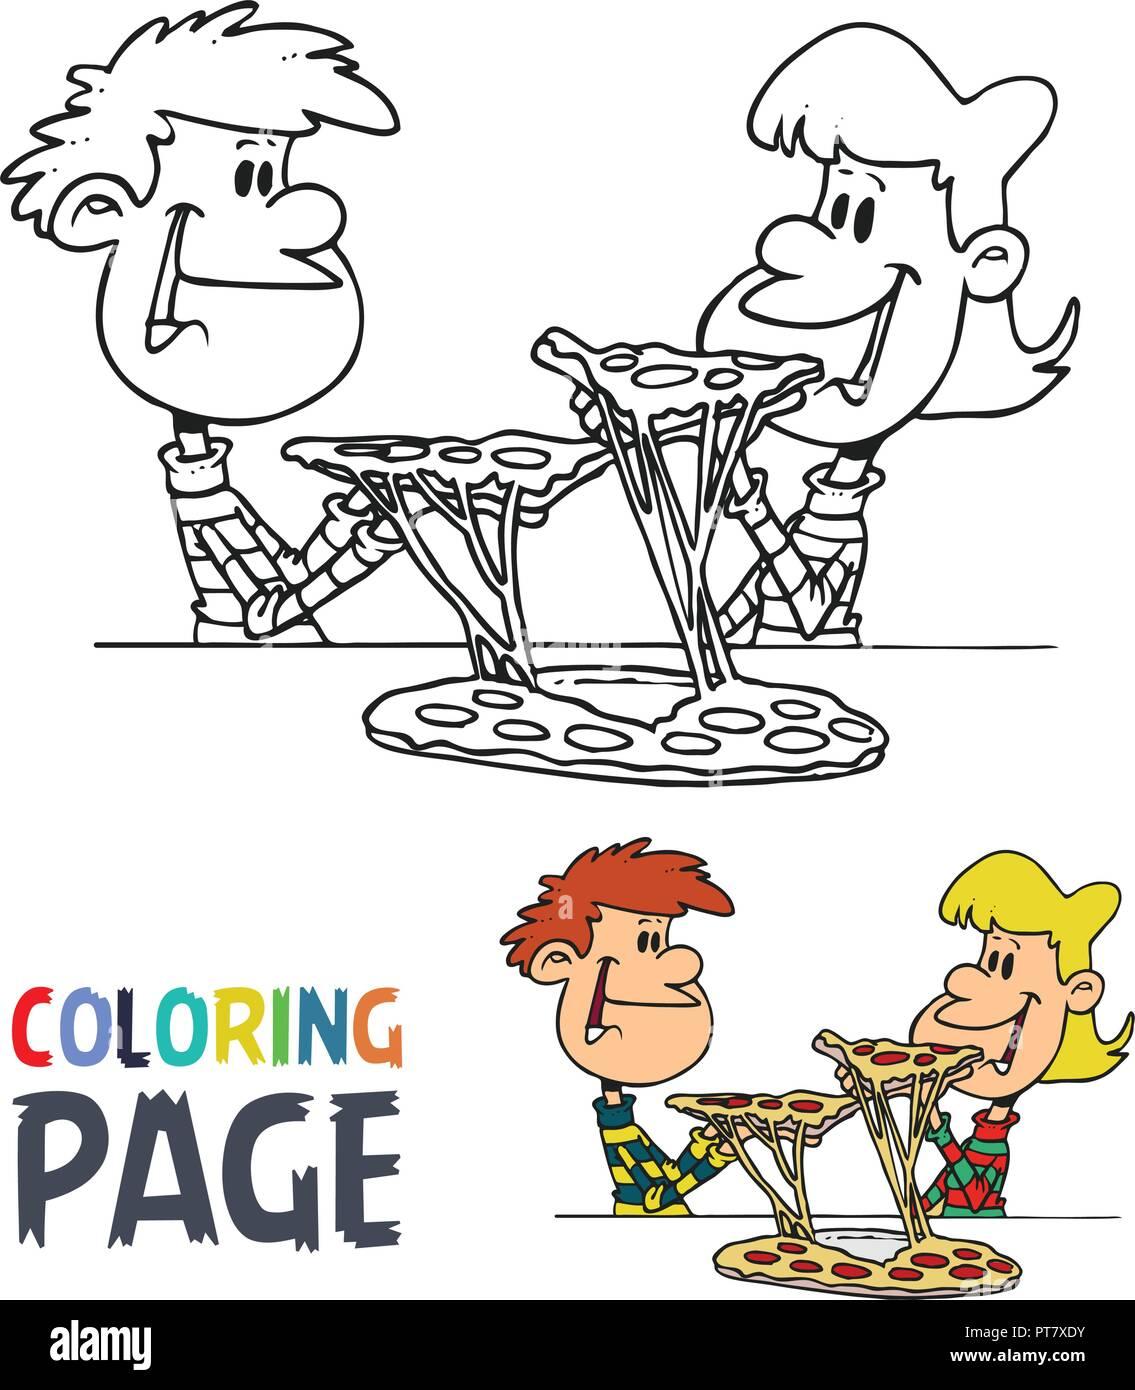 Coloriage Emoji Pizza.Coloriage Pizza Coloriage Les Pizzas Sur Hugolescargotcomcoloriage A